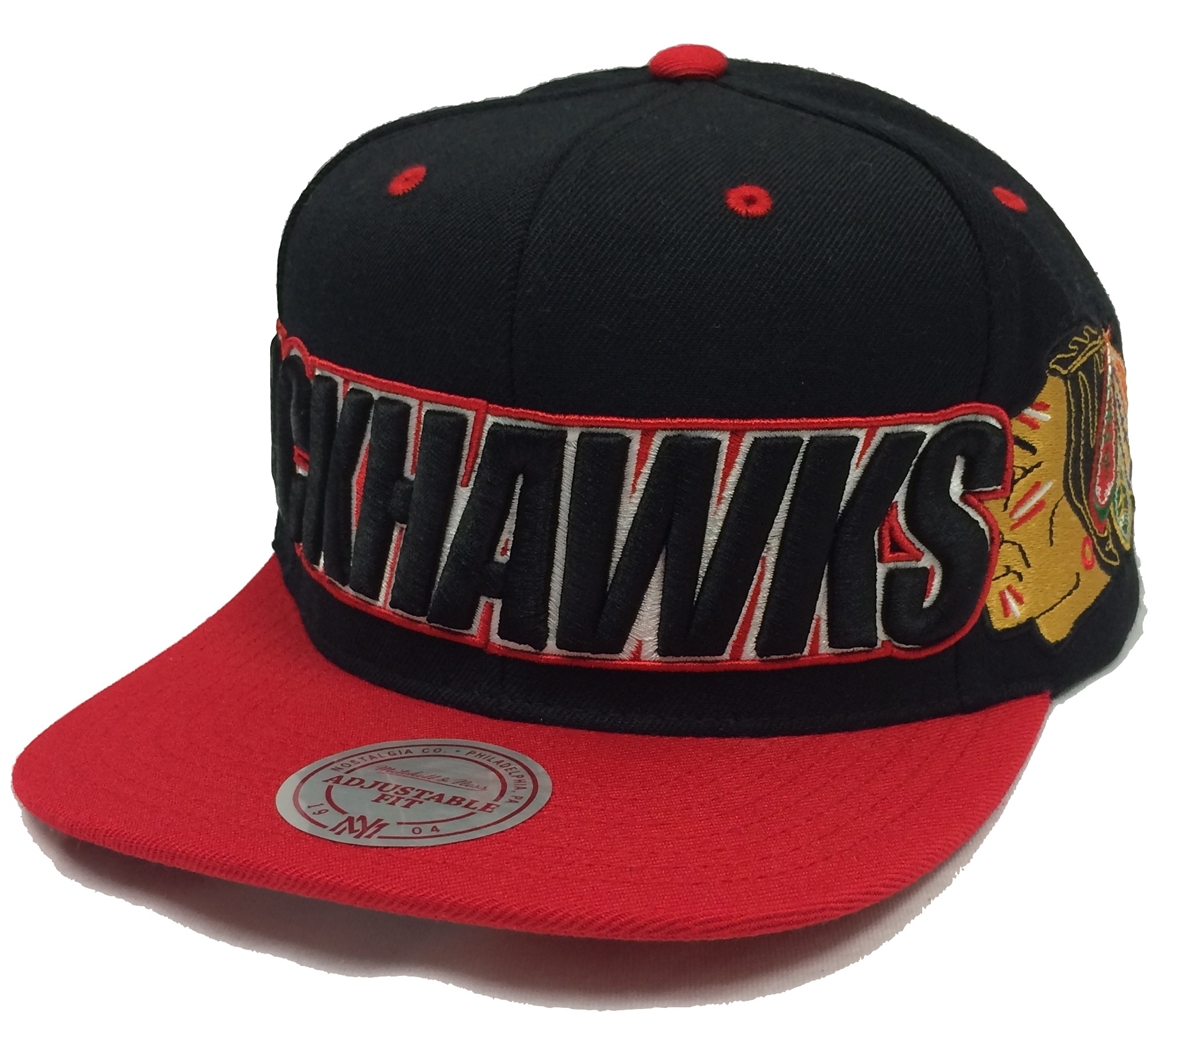 a8c1c69dc7ac8 Mitchell   Ness Wordmark Chicago Blackhawks Black   Red Snapback